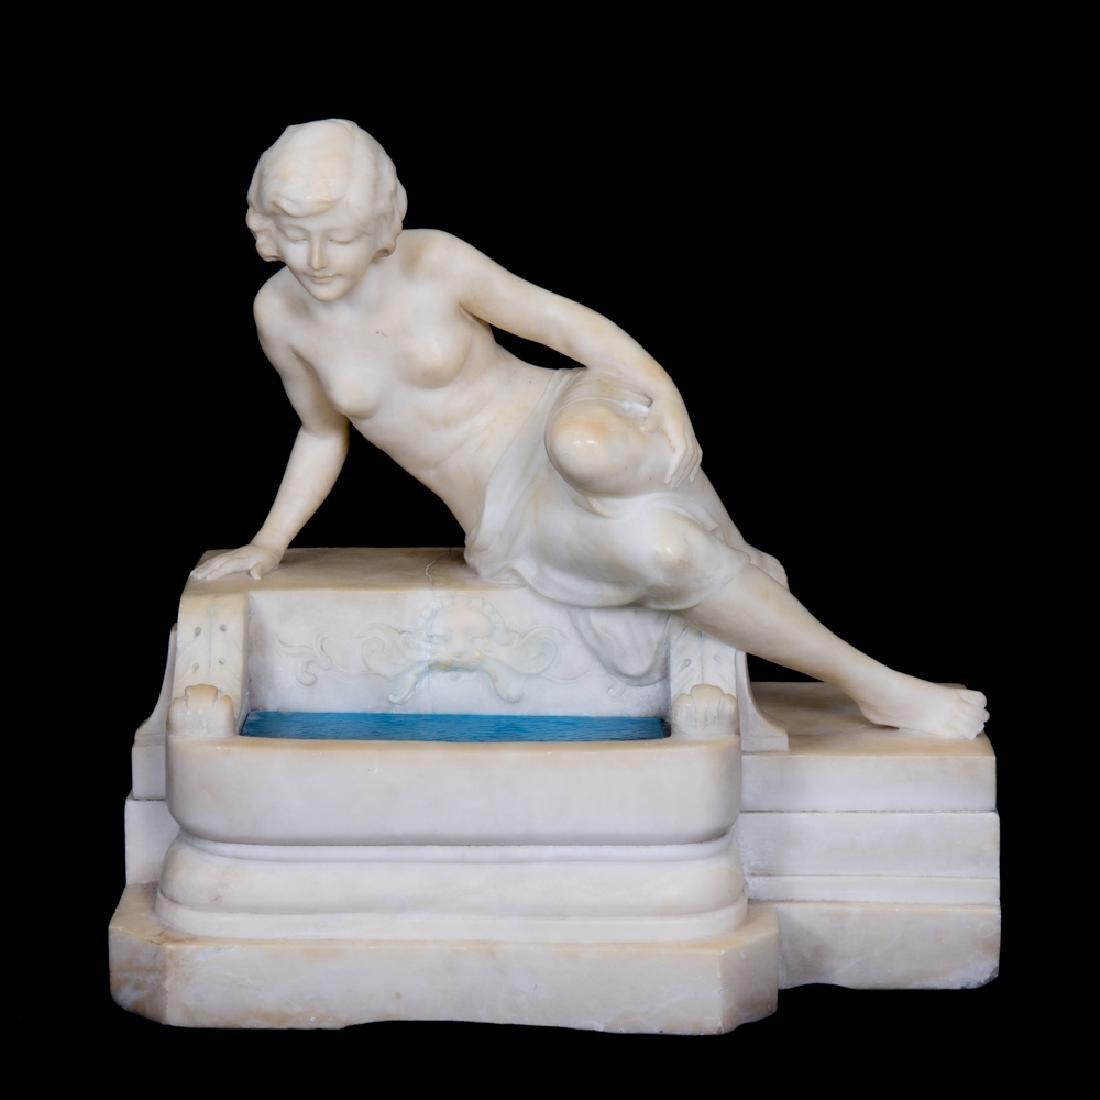 An Art Deco Carved Alabaster Light Depicting a Female